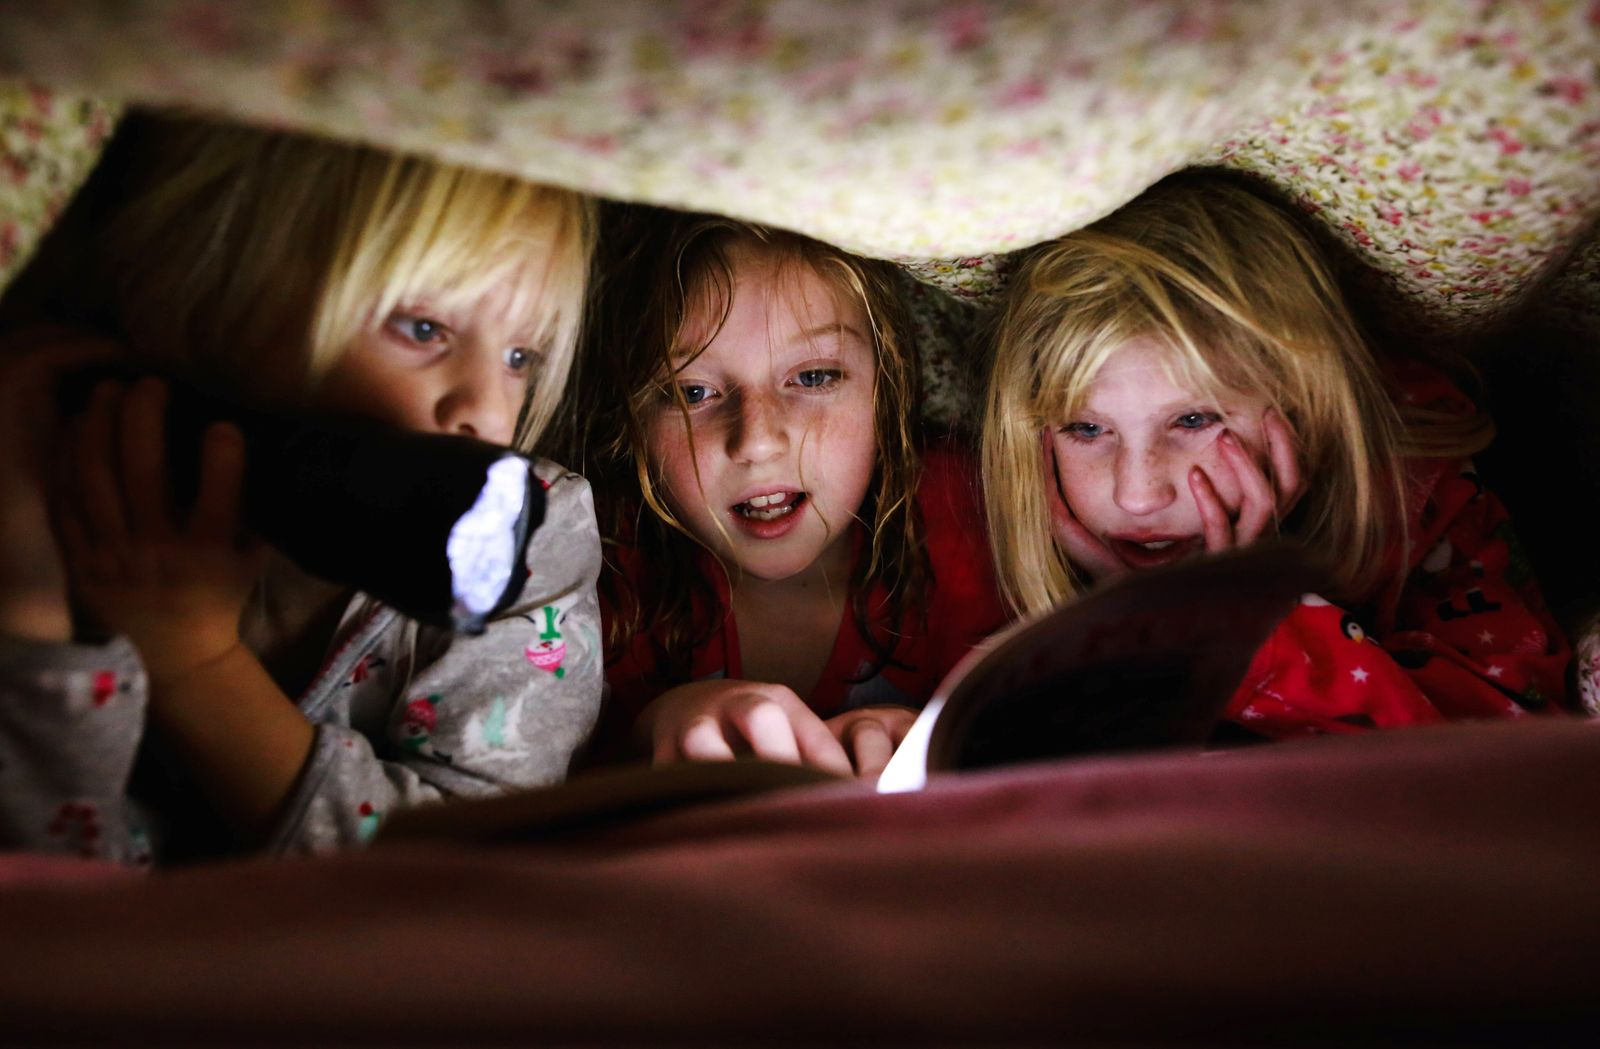 Three little girls reading book under blanket with flashlight Windsor, ON, Canada ,model released, Symbolfoto PUBLICATIO